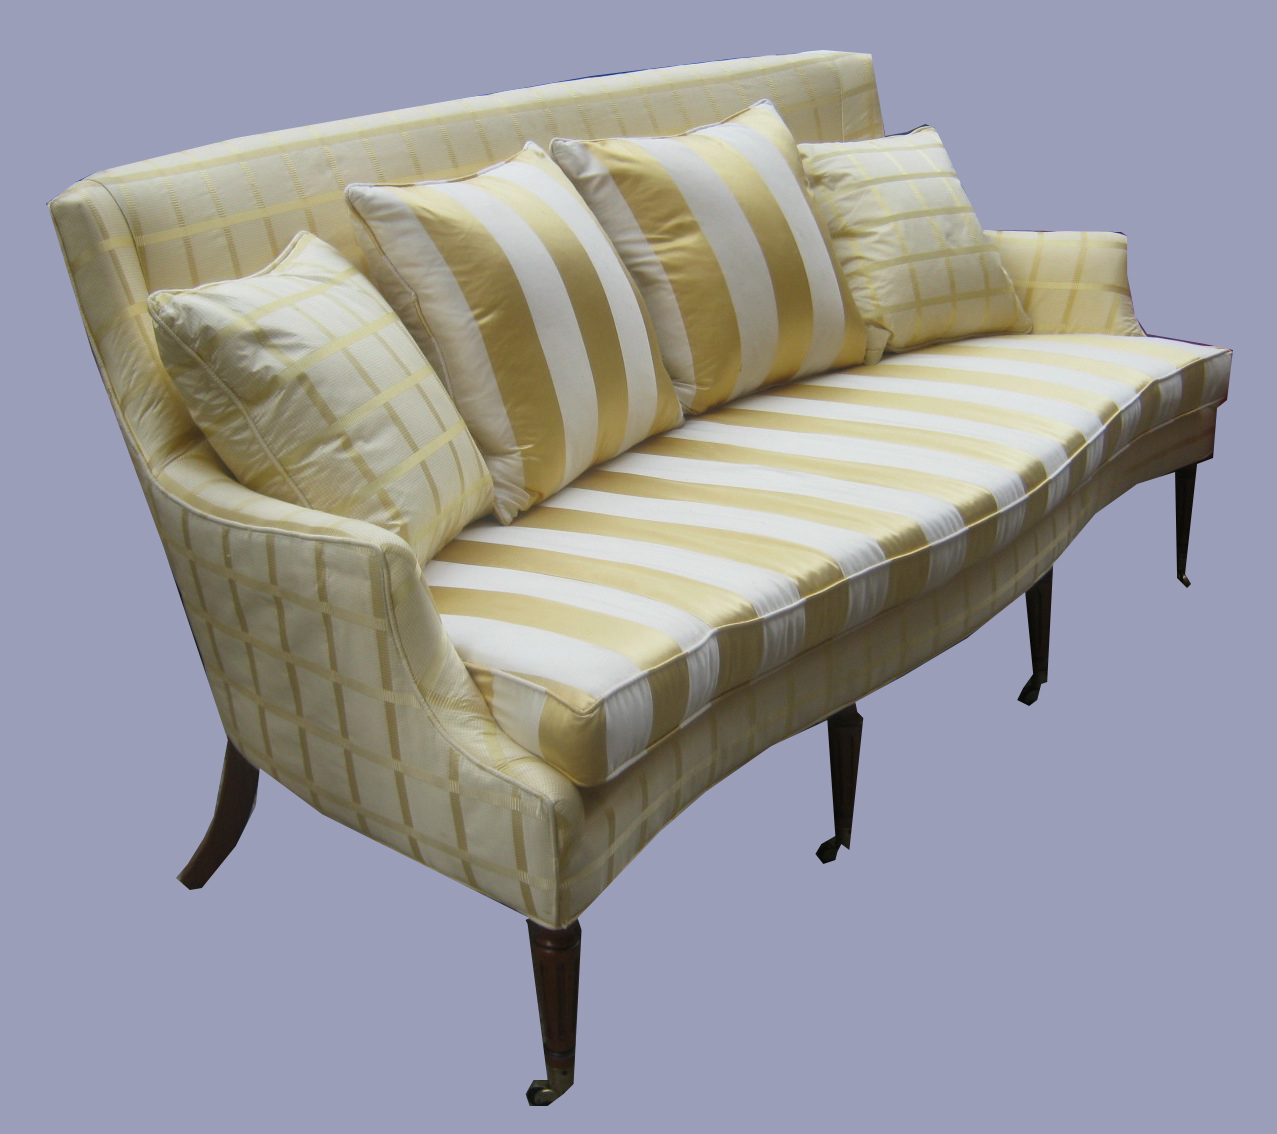 Uhuru Furniture Collectibles Sheraton Style Sofa In Silk Upholstery Sold